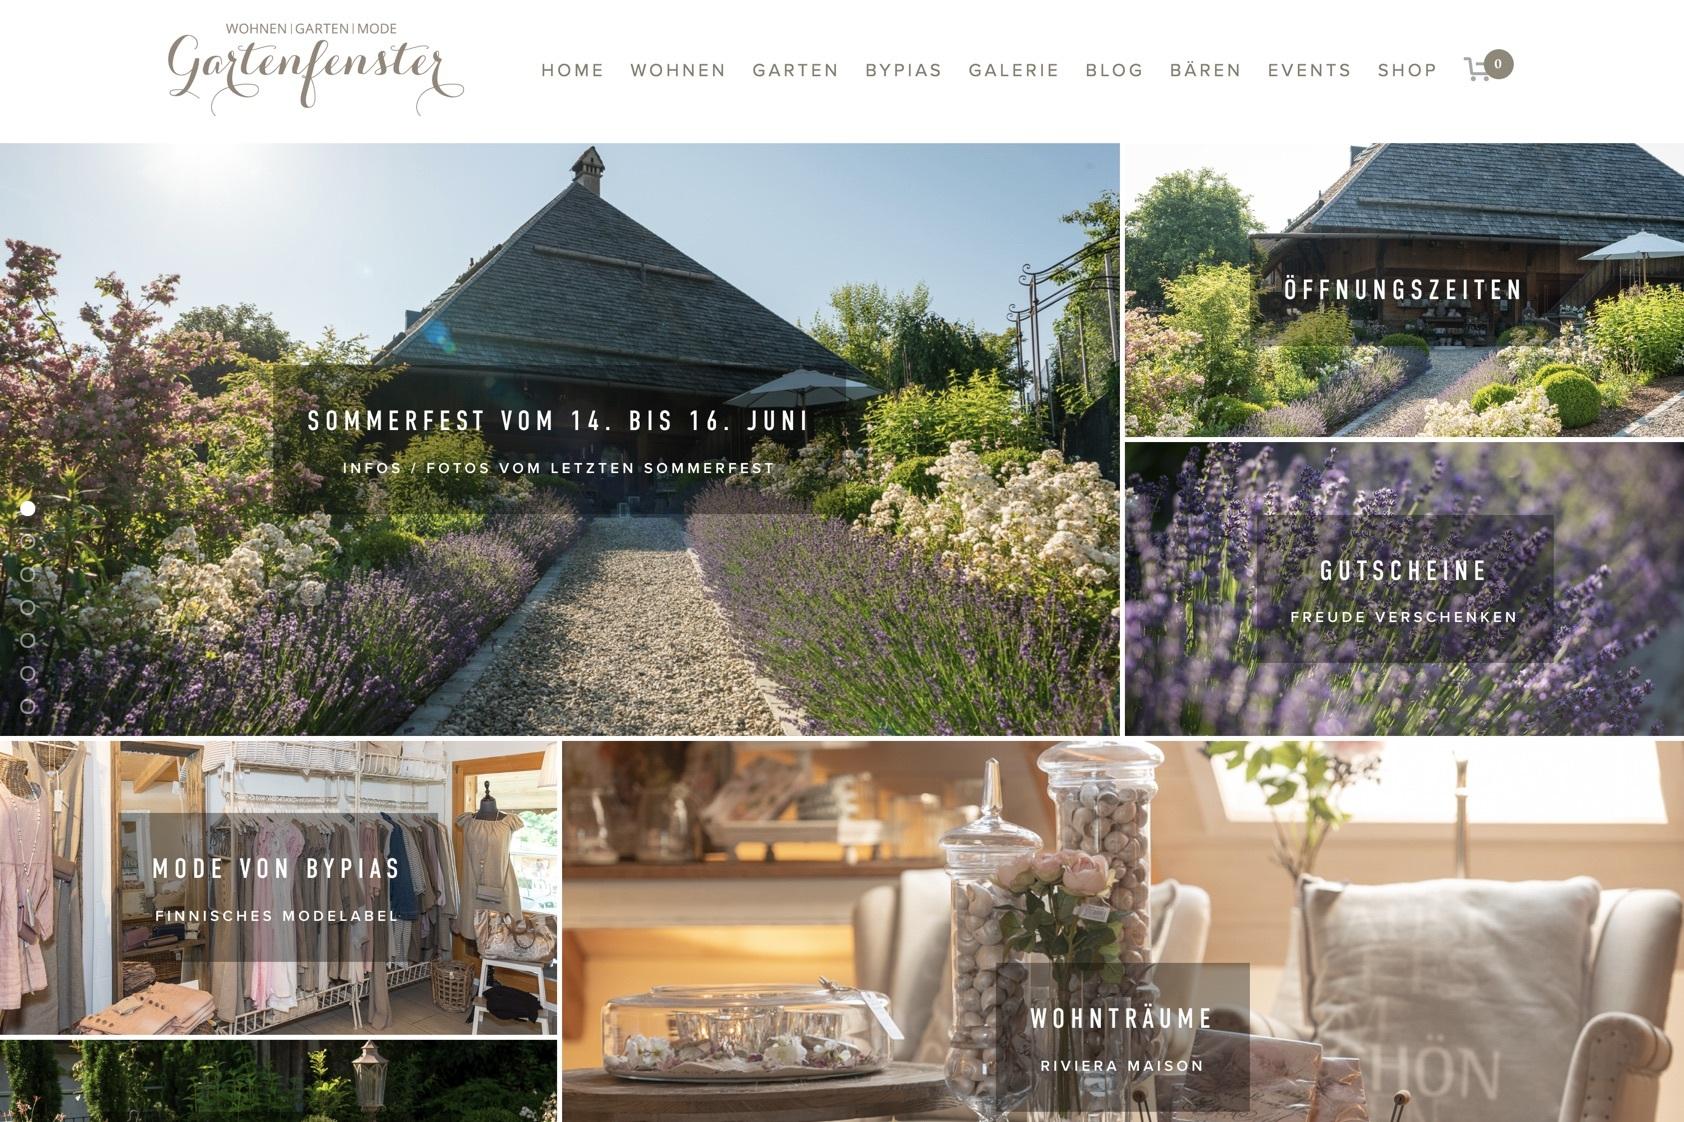 www.gartenfenster.ch - Webdesign & Reportagebilder